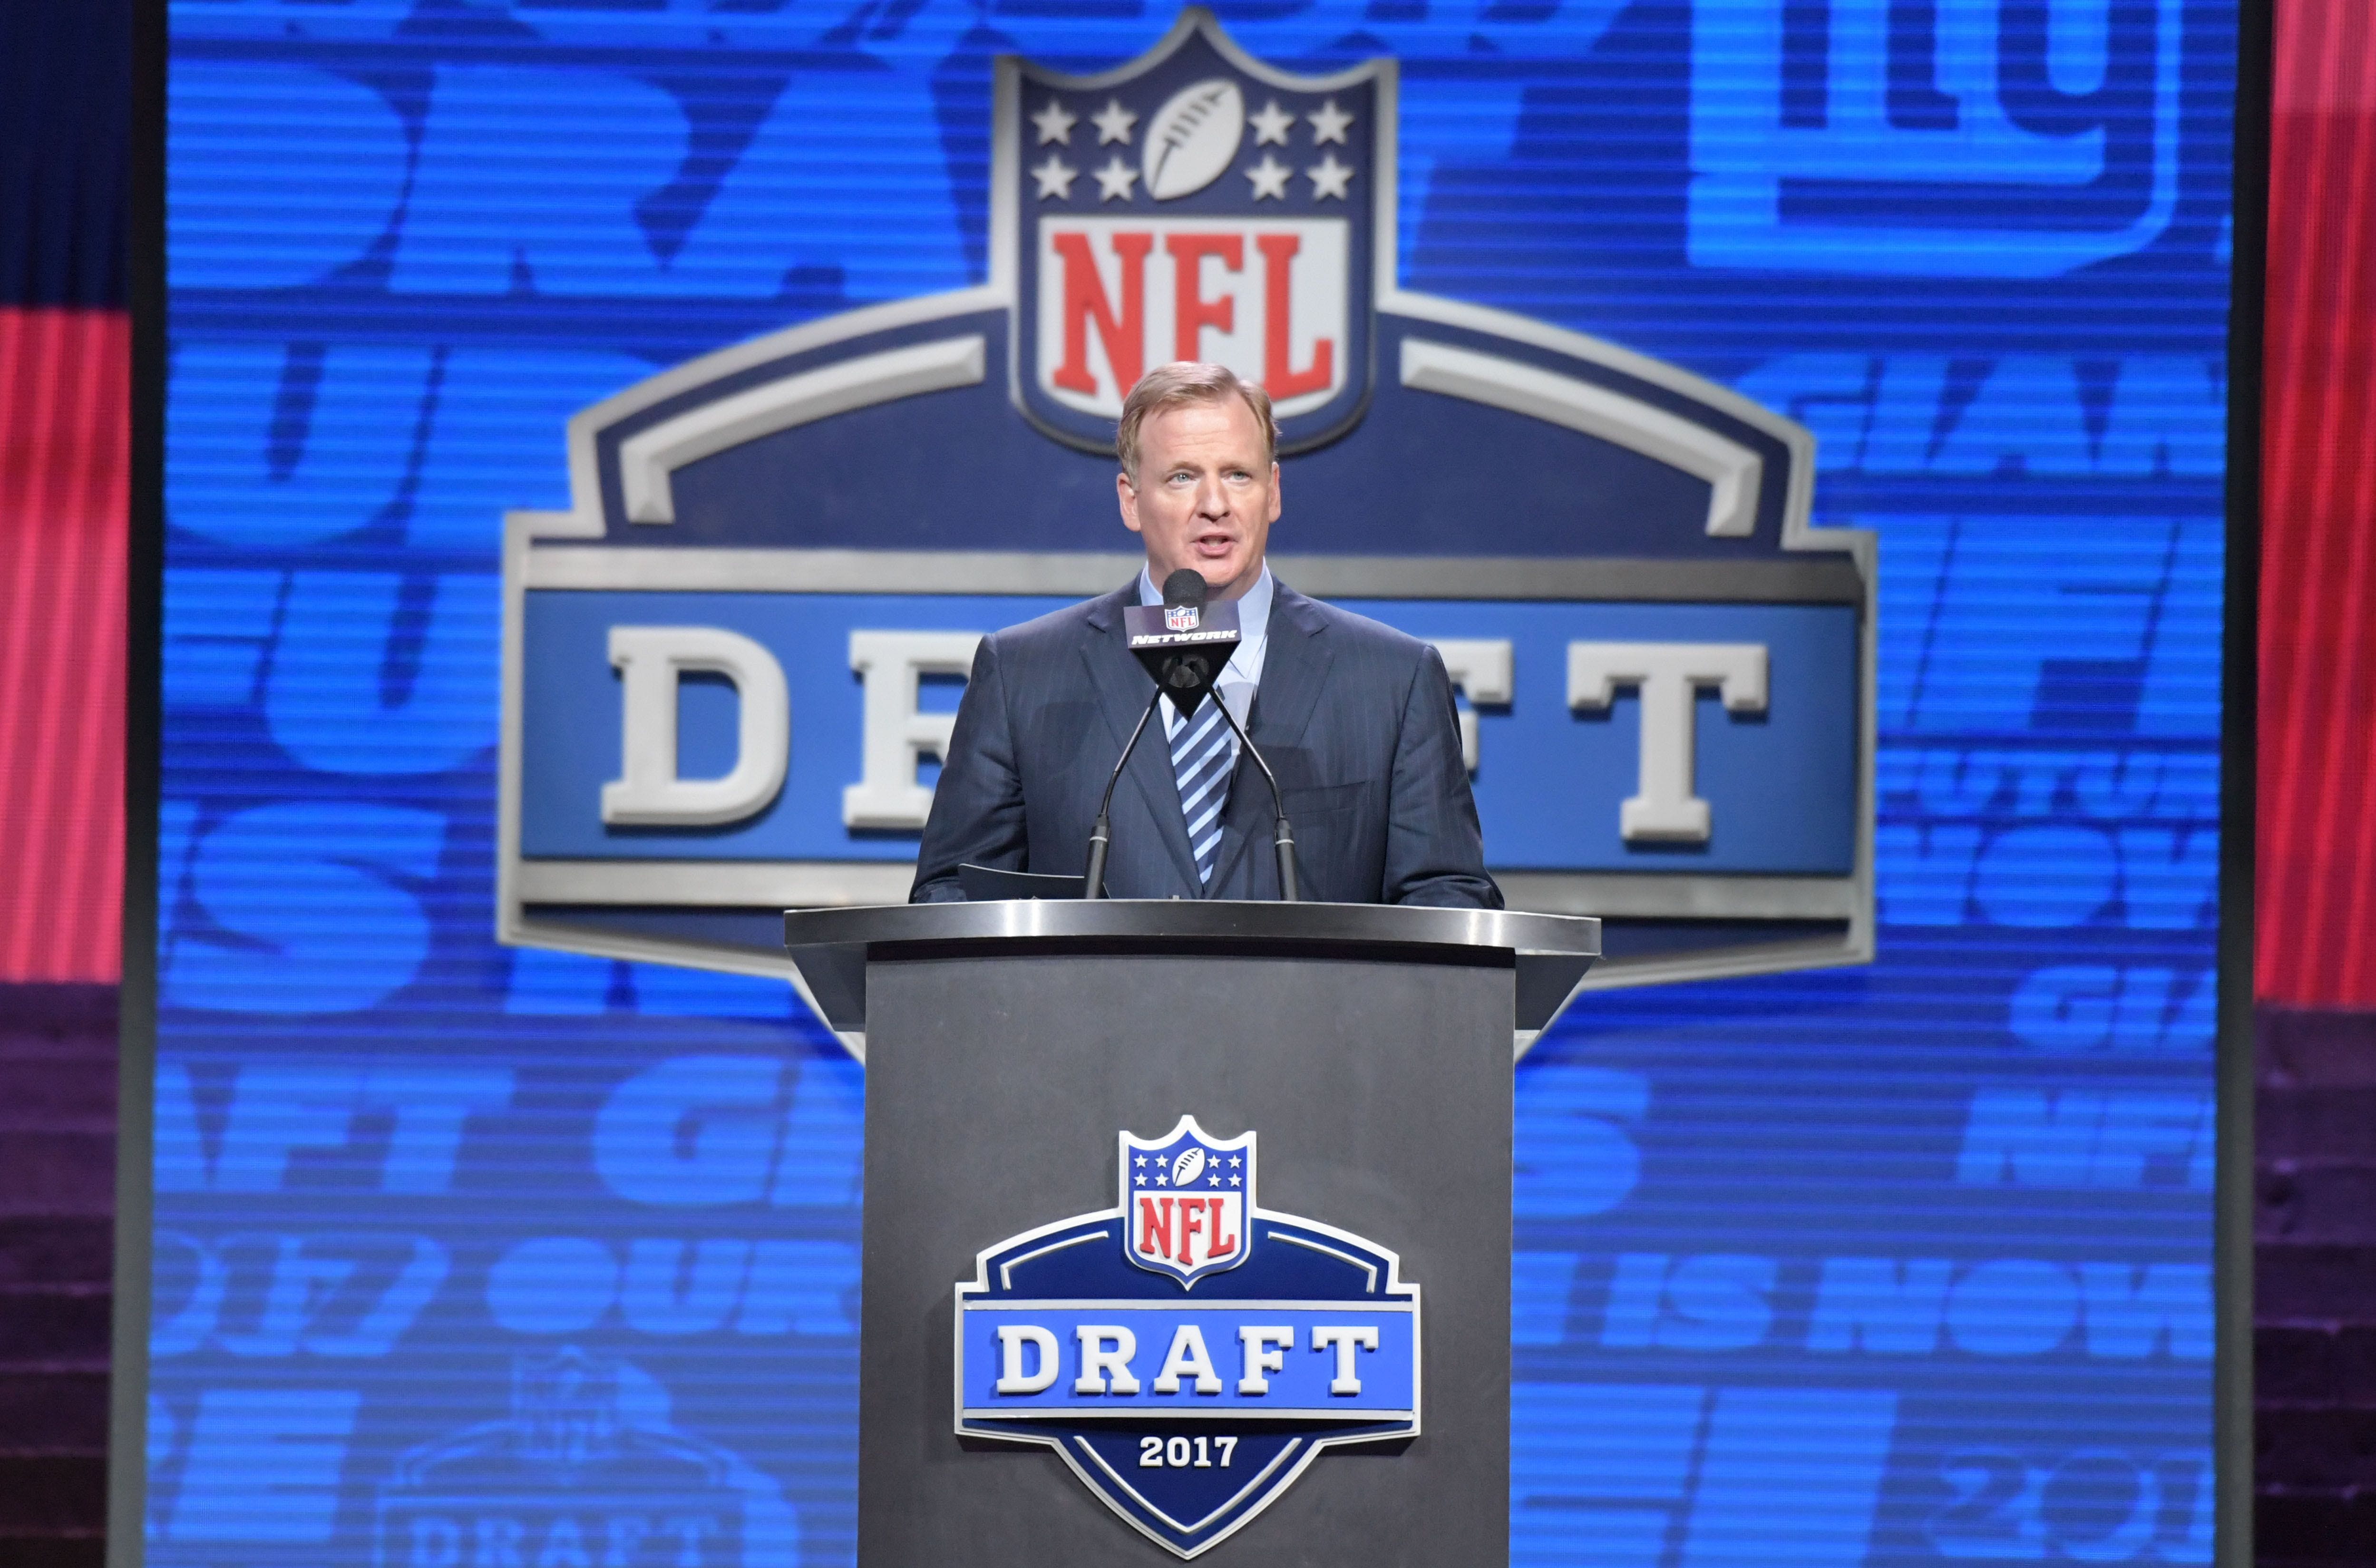 NFL draft tracker 2017: Live second- and third-round picks, analysis